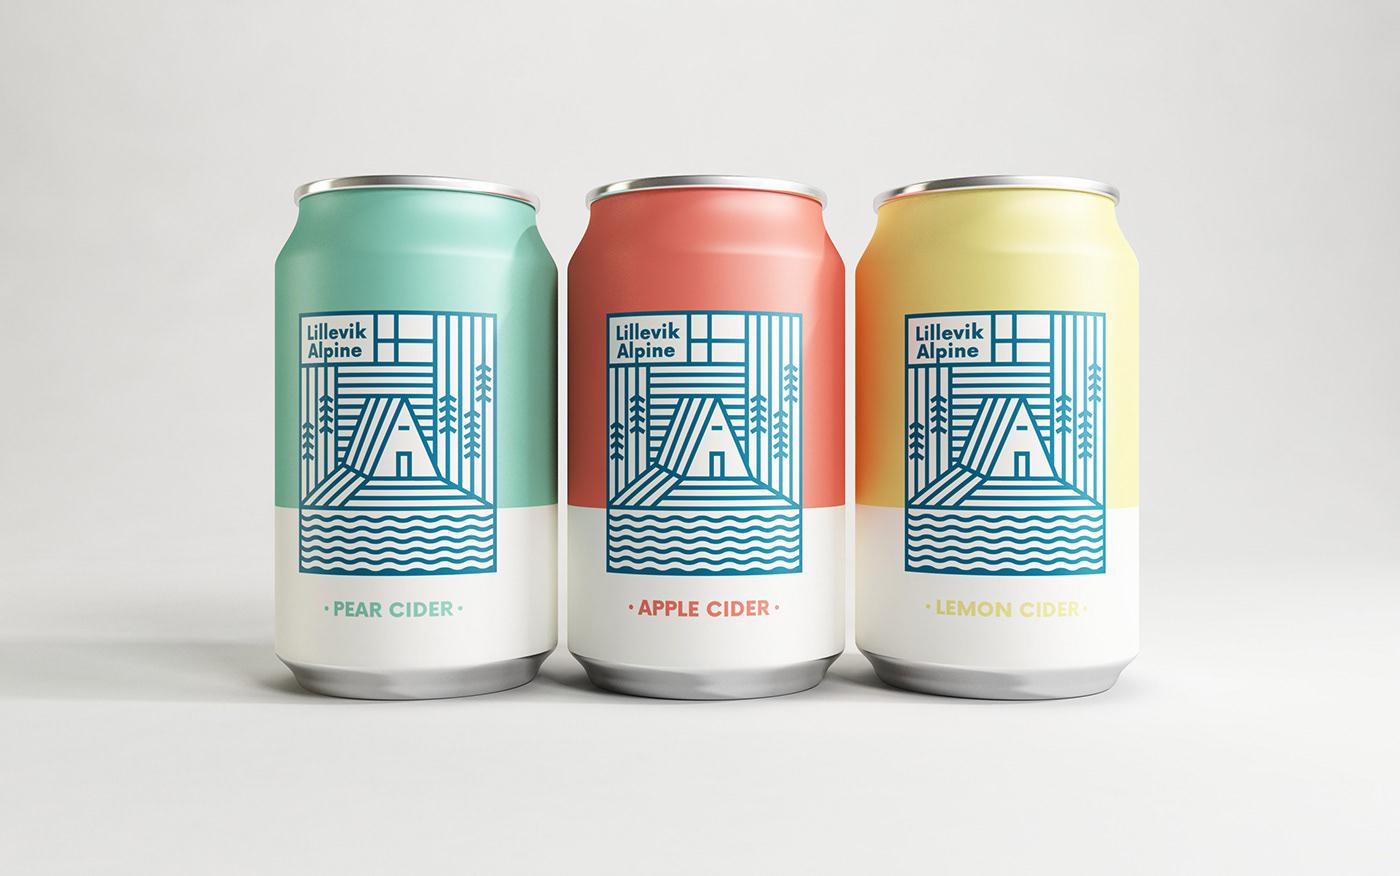 Label cider apple cidra lillevik alpine alcohol Packaging identity visual